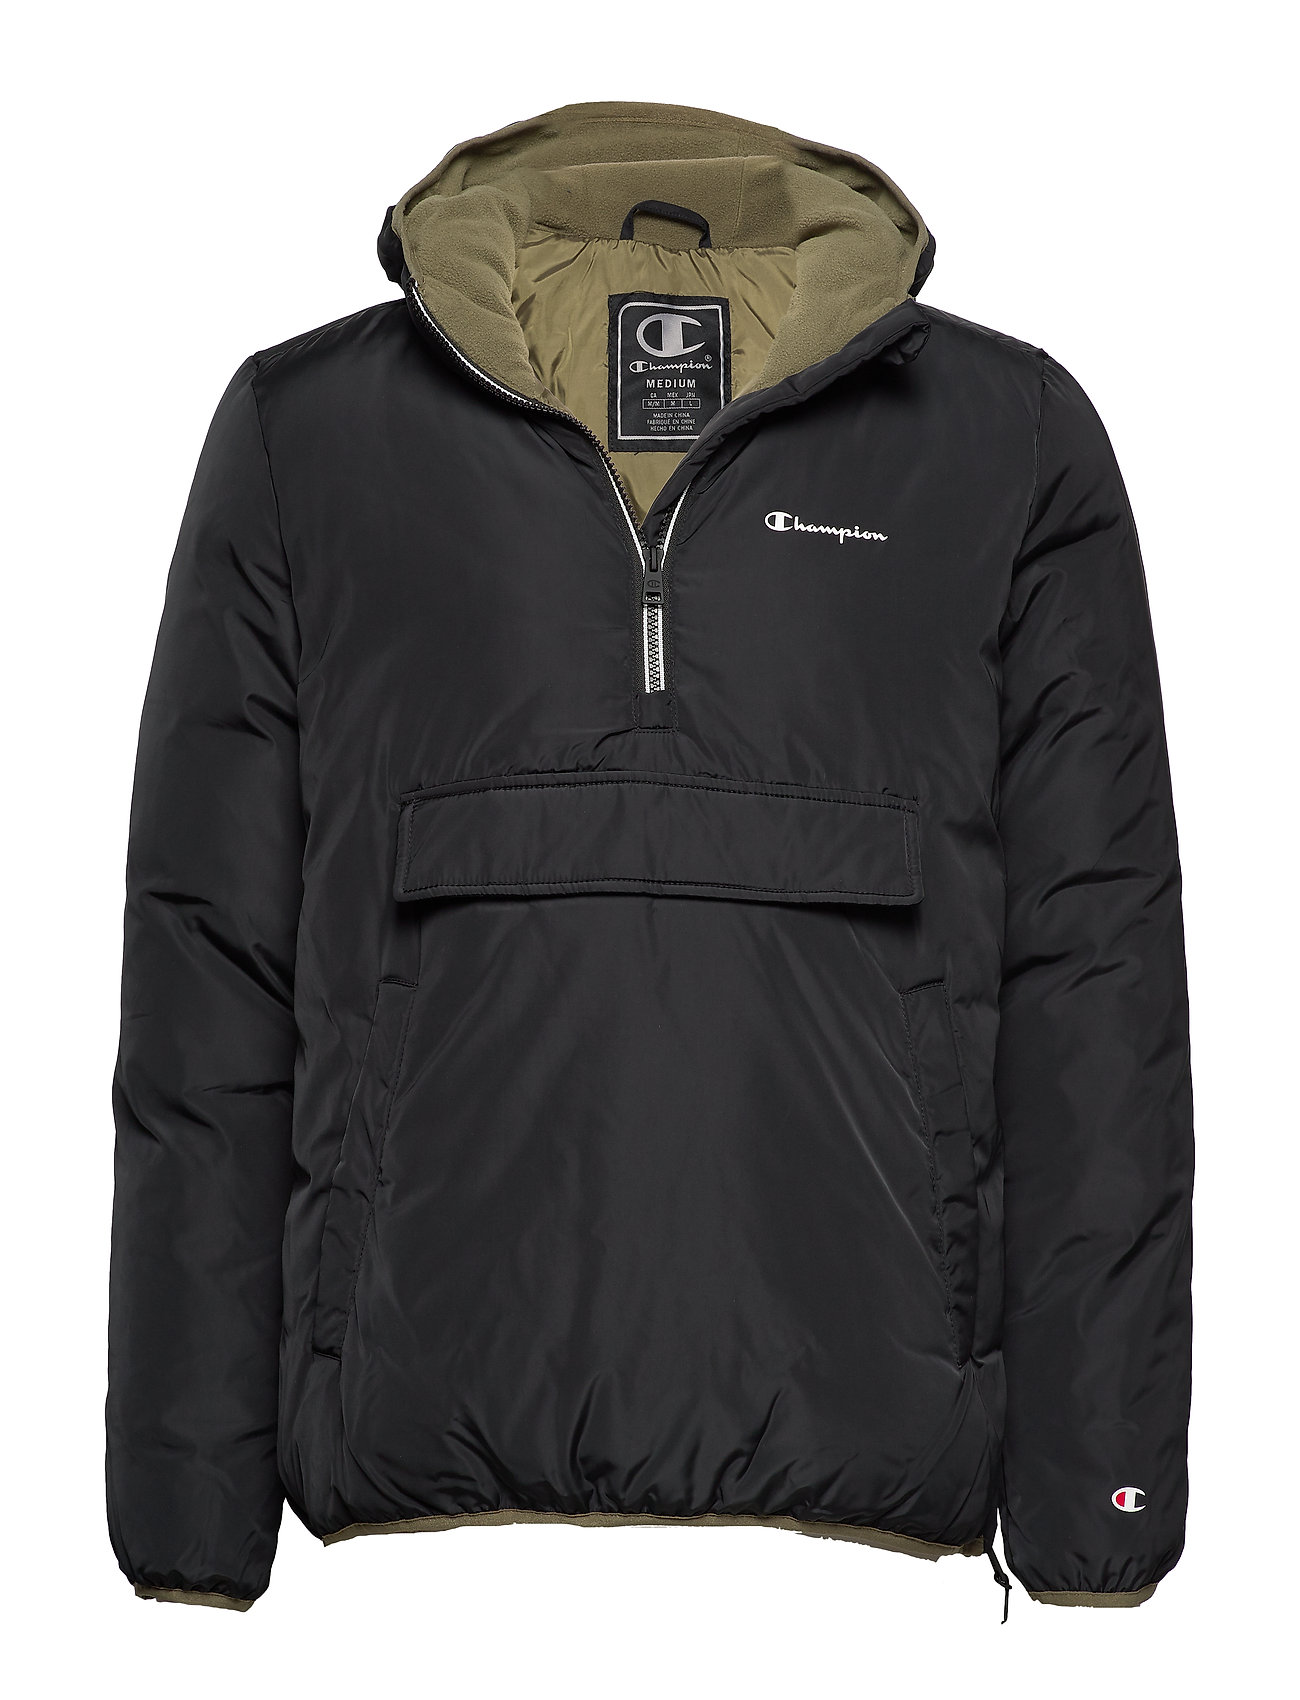 CHAMPION Hooded Jacket Outerwear Jackets Anoraks Schwarz CHAMPION